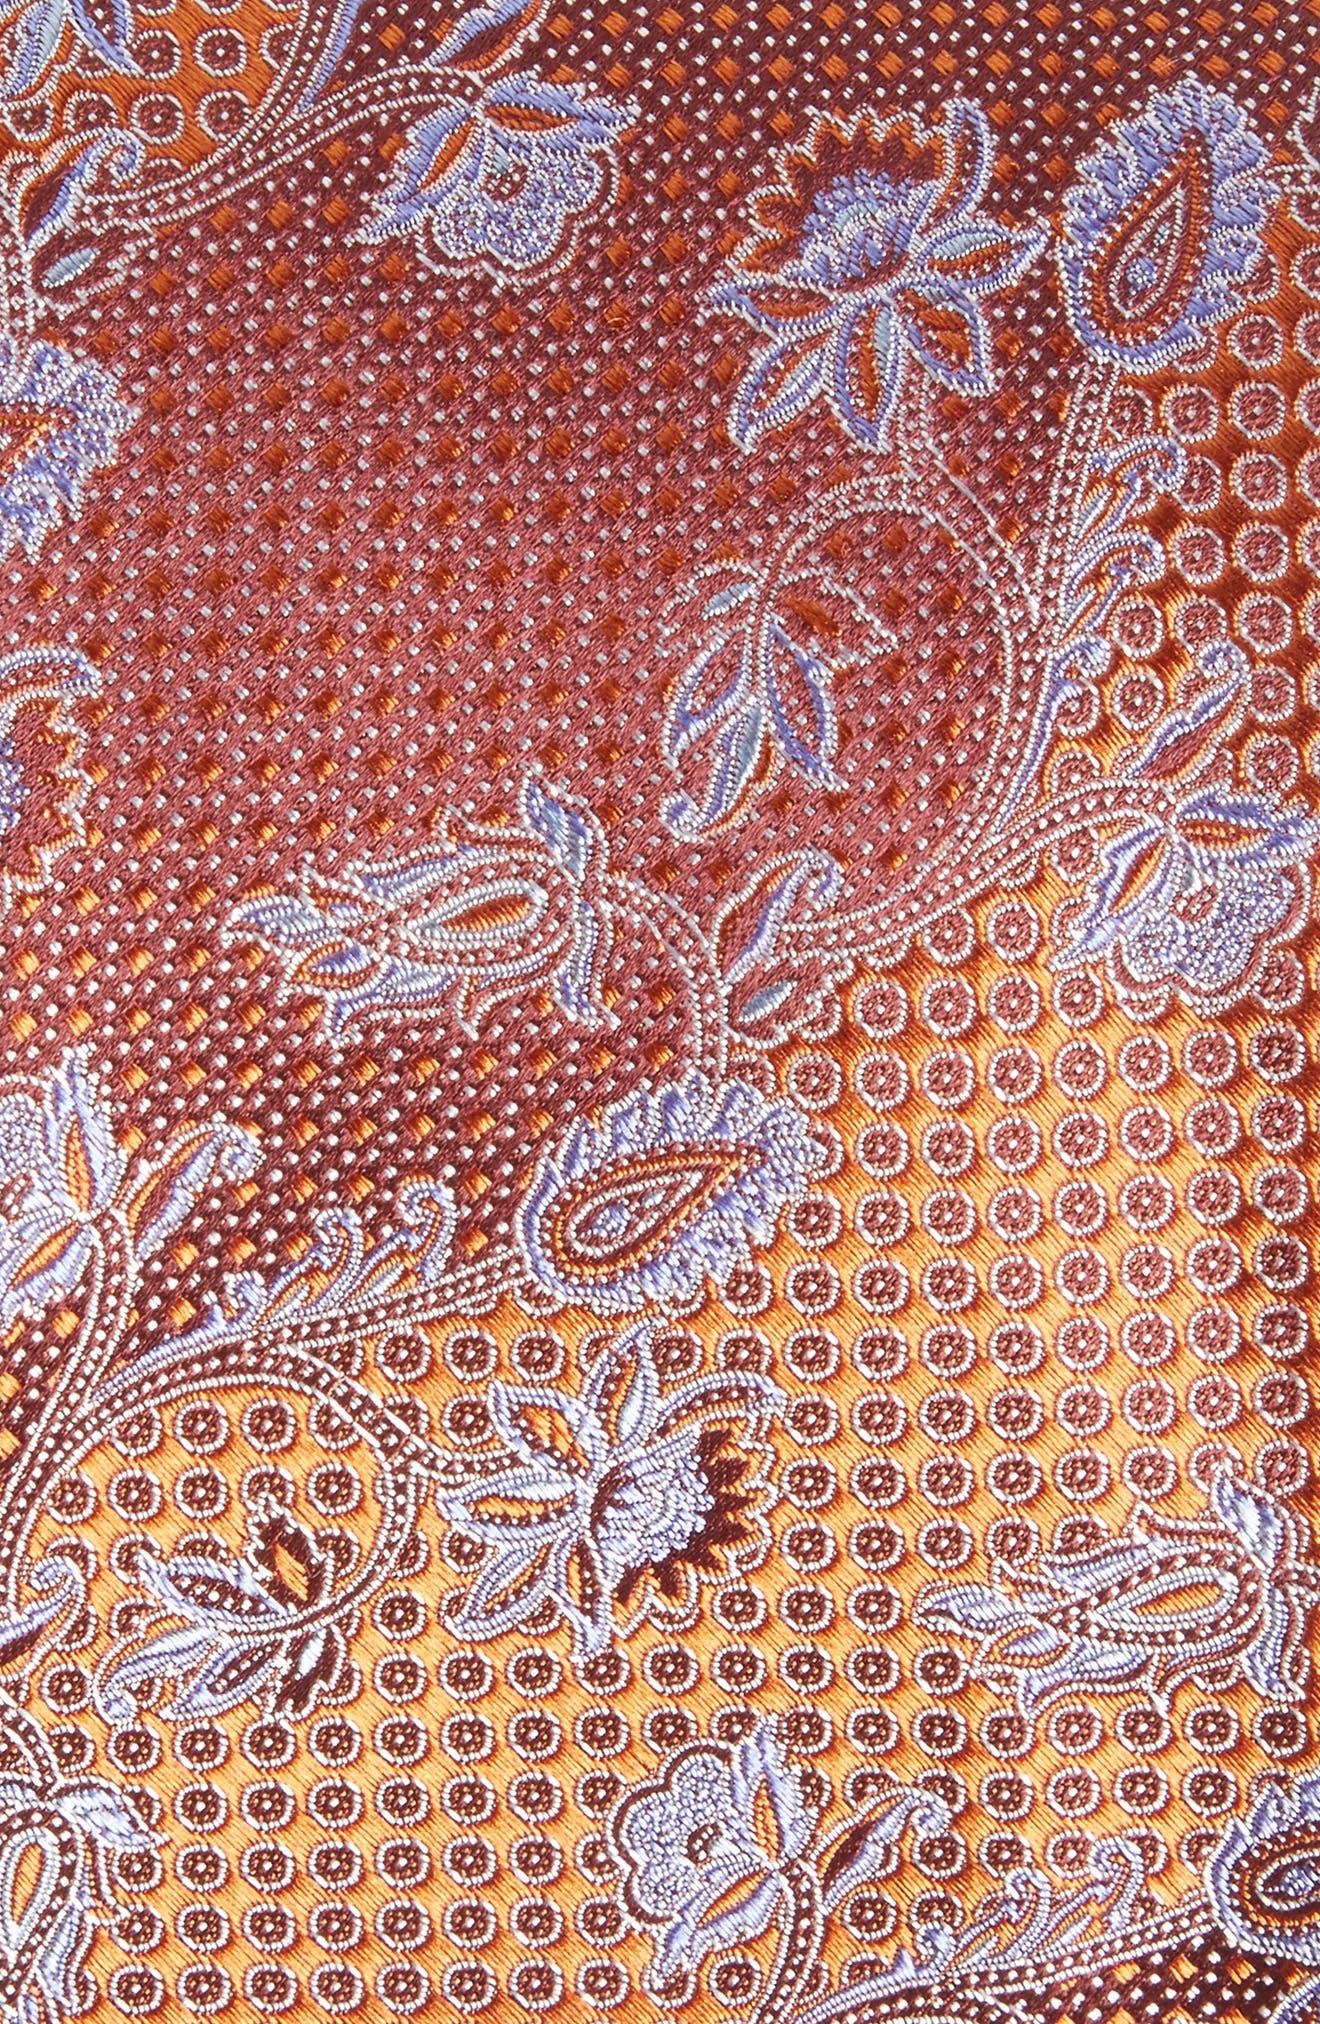 Demarco Floral Silk Tie,                             Alternate thumbnail 2, color,                             808